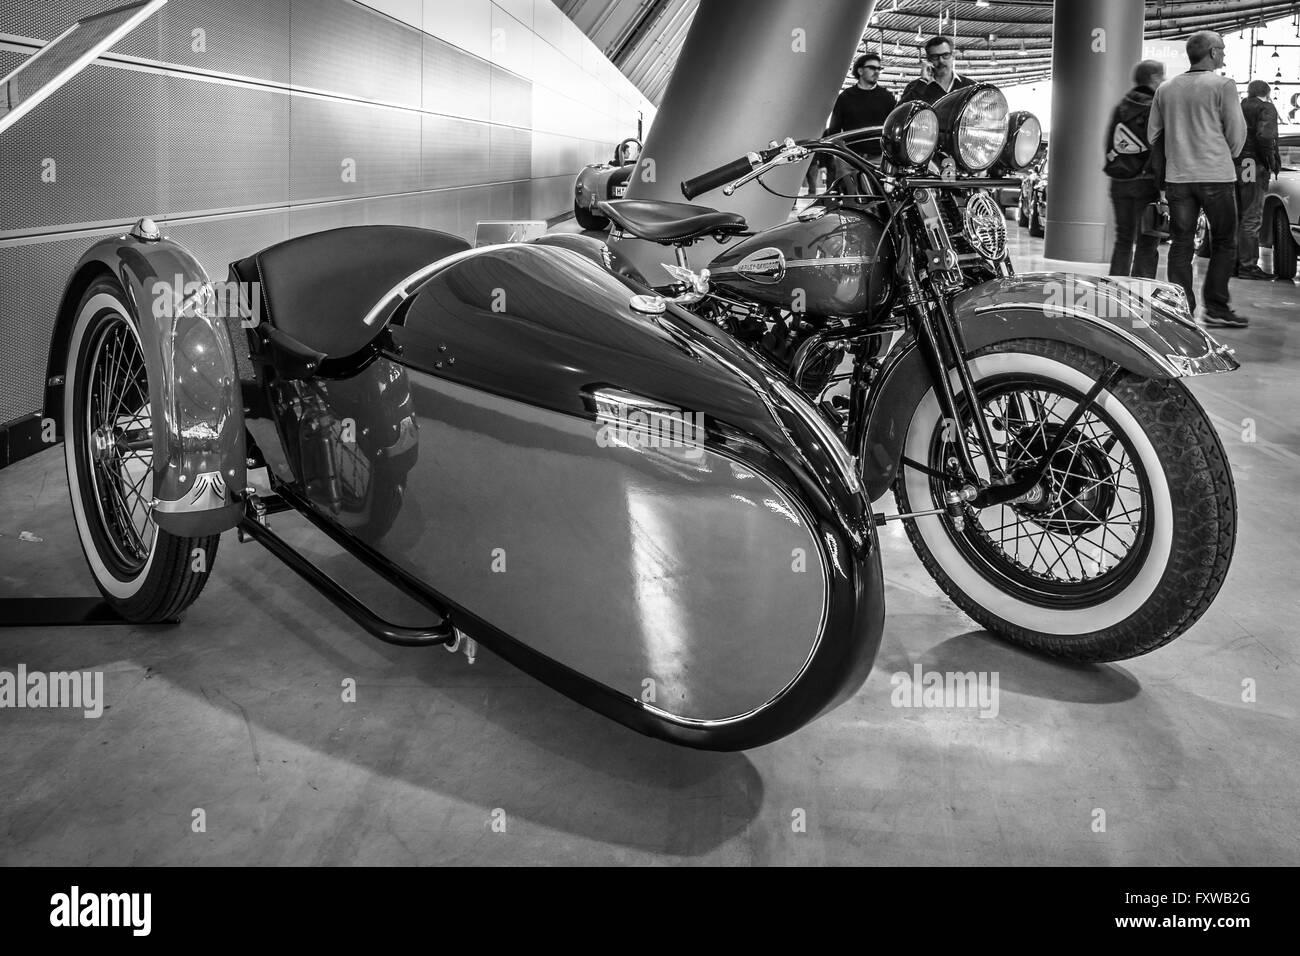 motorcycle harley davidson wla 45 gespann 1944 with sidecar simard stock photo 102590392 alamy. Black Bedroom Furniture Sets. Home Design Ideas